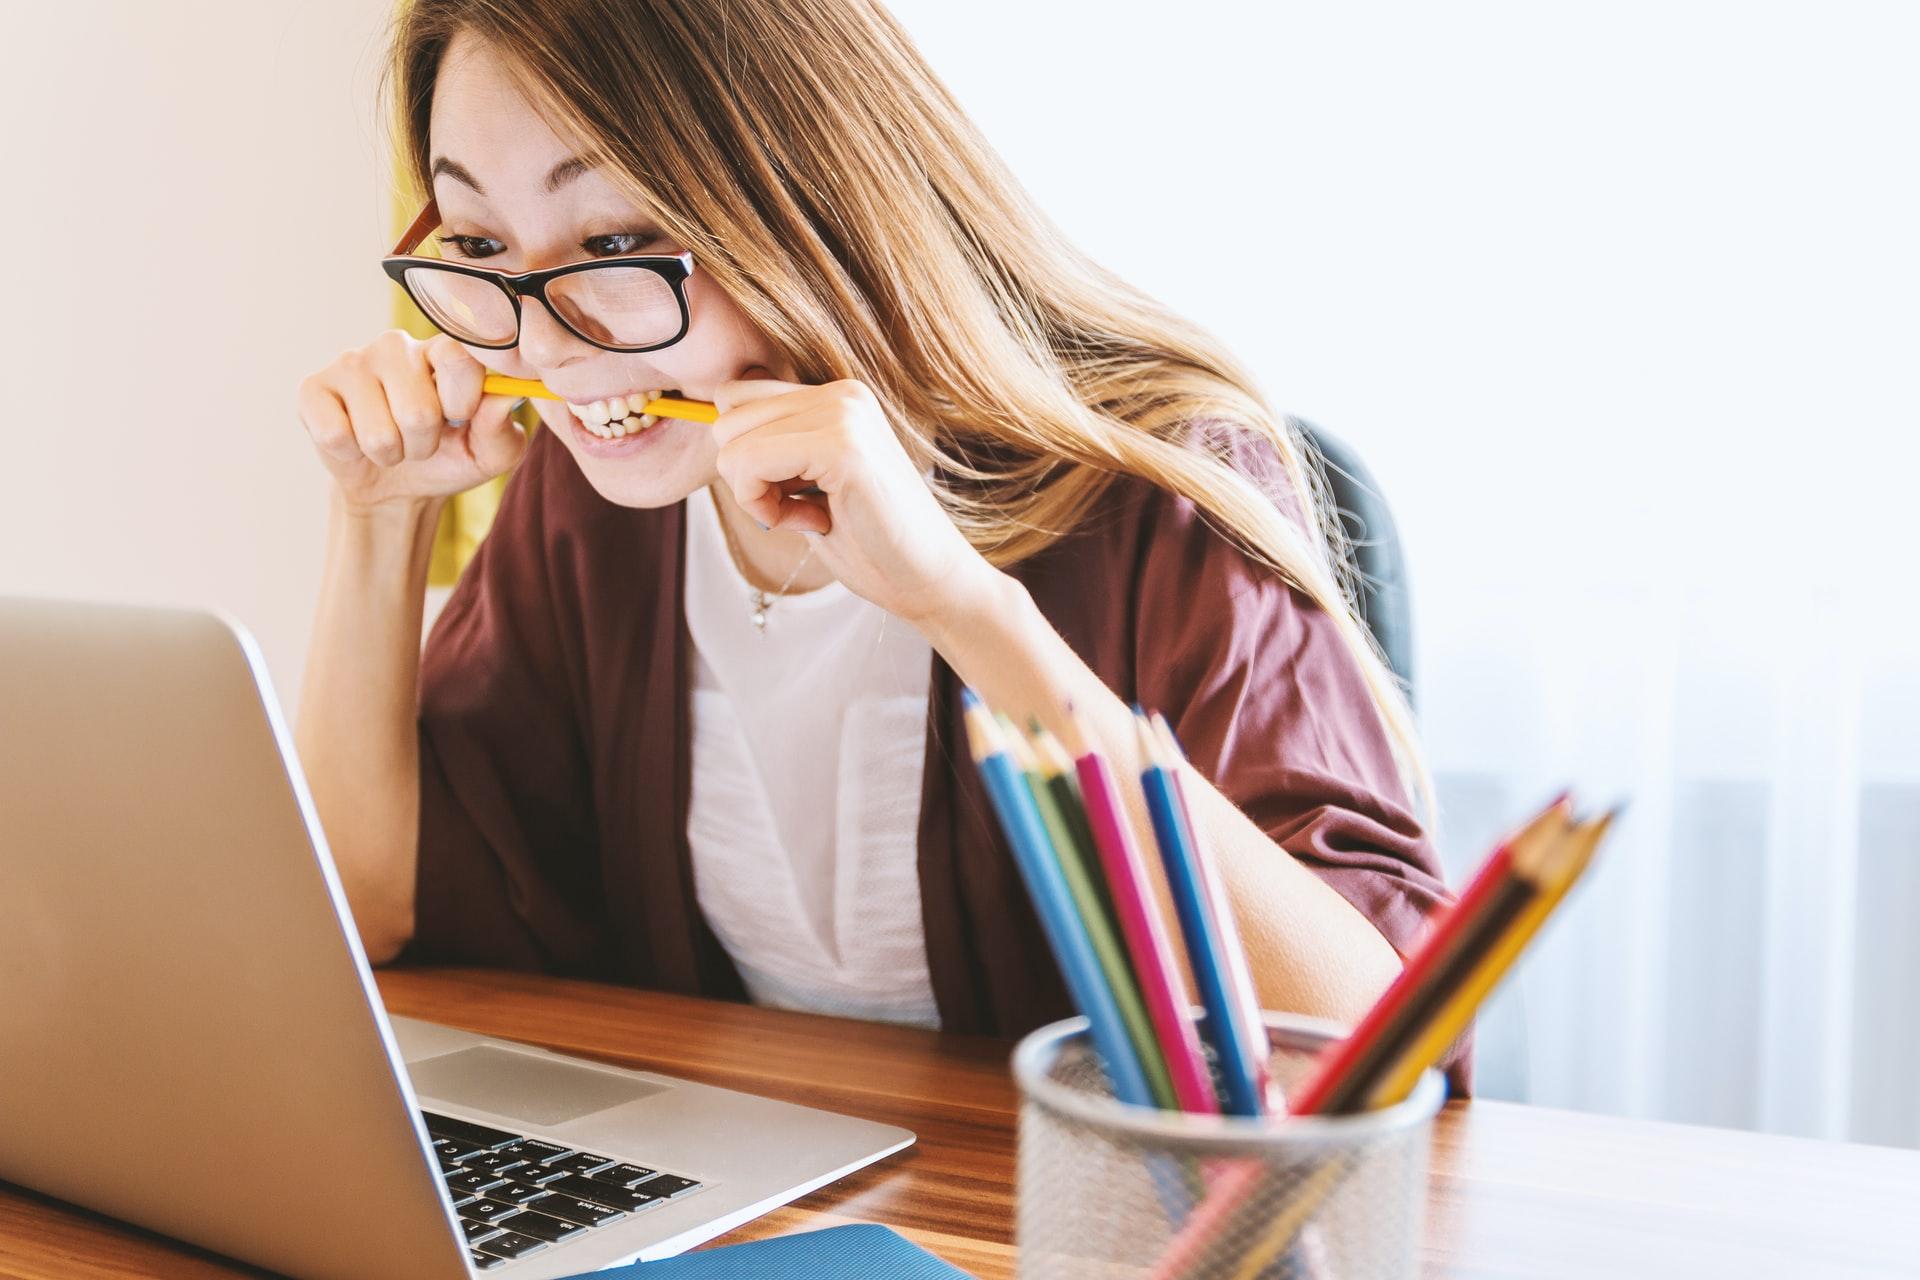 Onde Aprender Marketing Digital De Graça